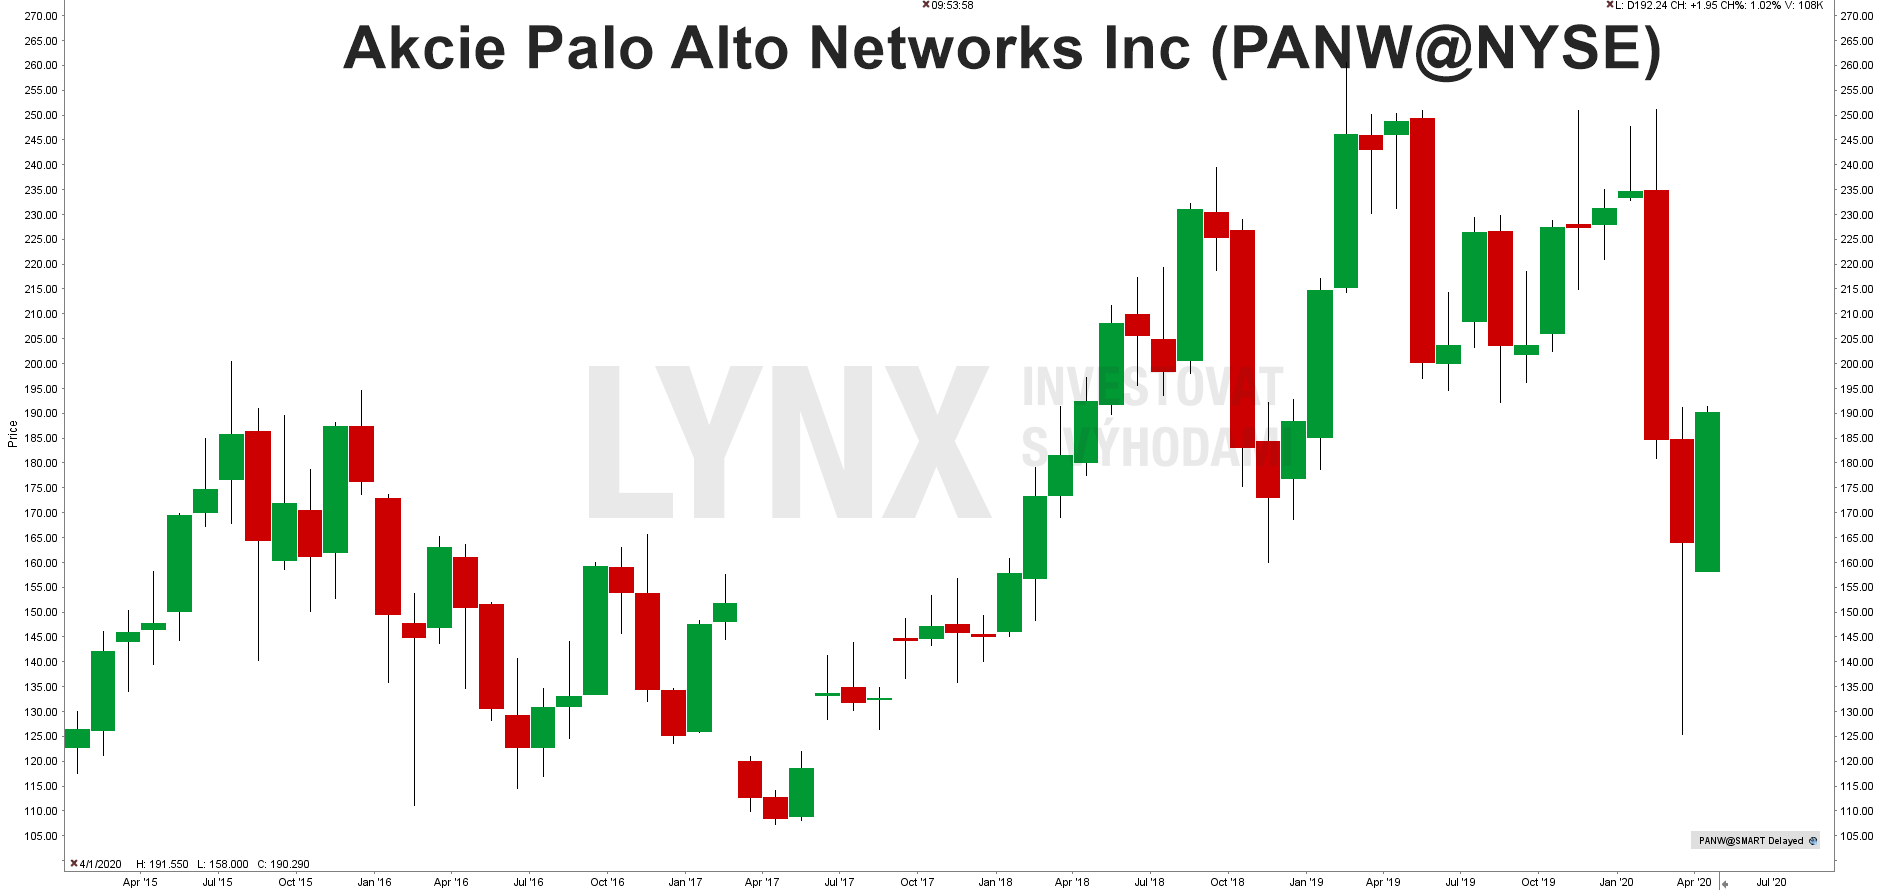 Akcie Palo Alto Networks Inc (PANW@NYSE)